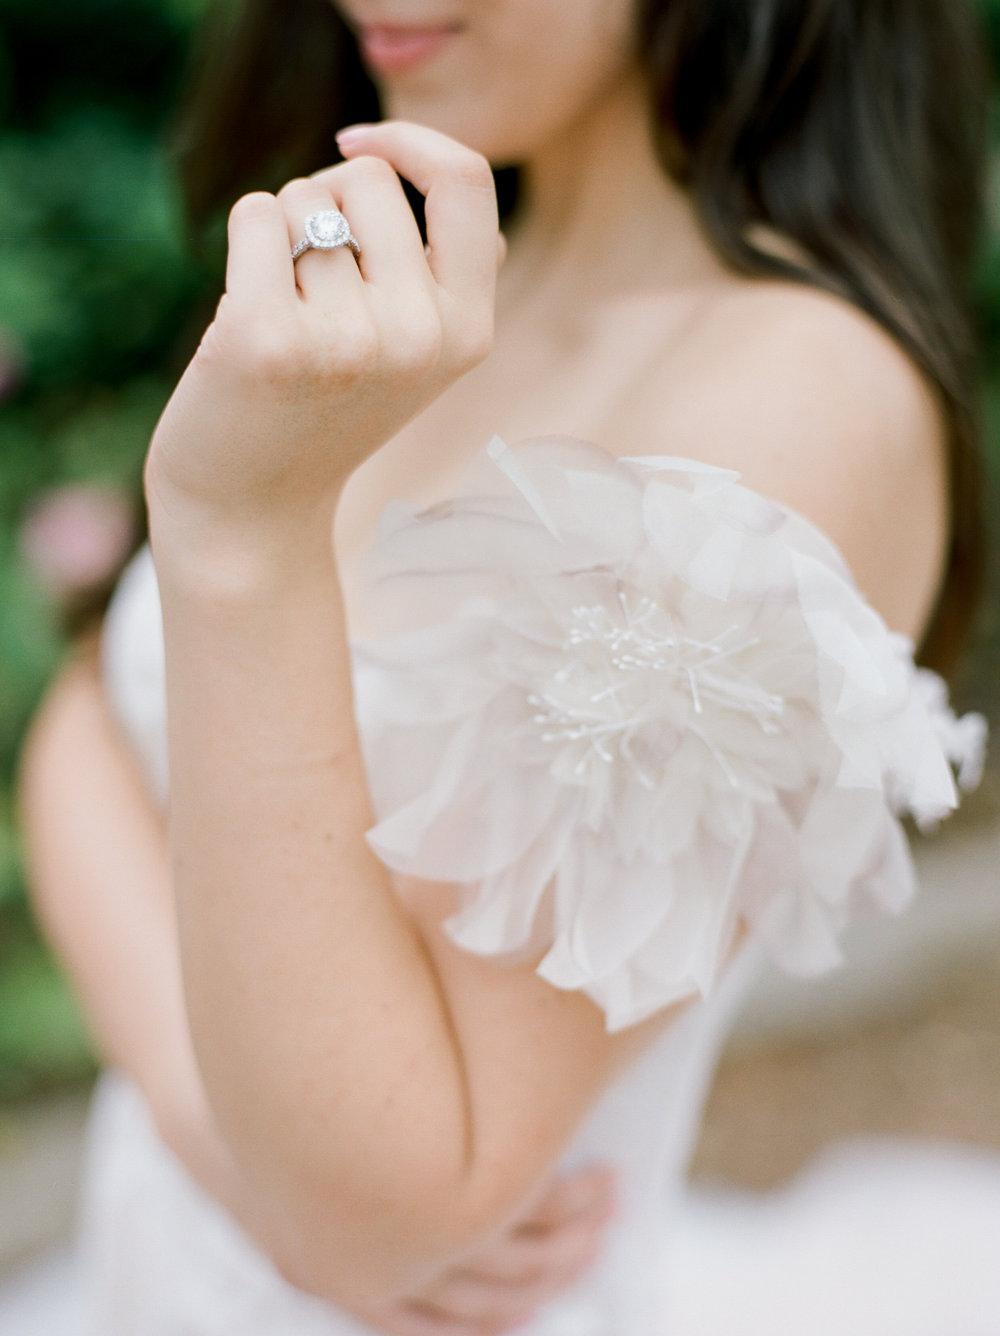 Fine-Art-Film-Houston-Wedding-Photographer-Best-Top-Luxury-Texas-Austin-Dallas-Destination-Dana-Fernandez-Photography-Portrait-Bridals-McGovern-Centennial-Gardens-5.jpg